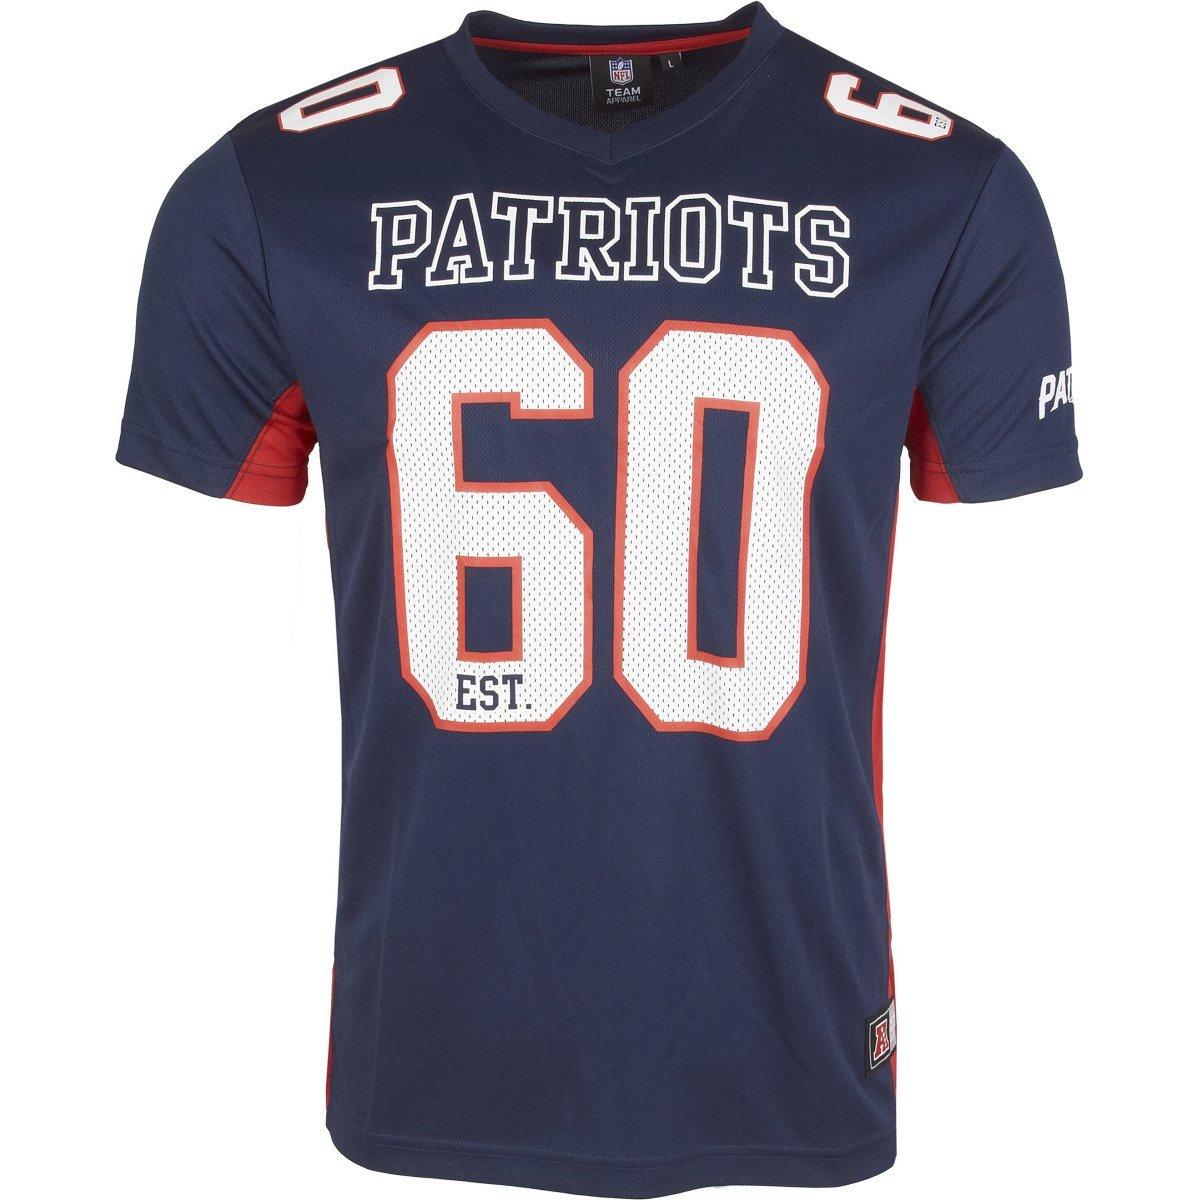 00e4c0b2c Majestic Green Bay Packers Moro Est. 21 Mesh Jersey NFL T-Shirt ...